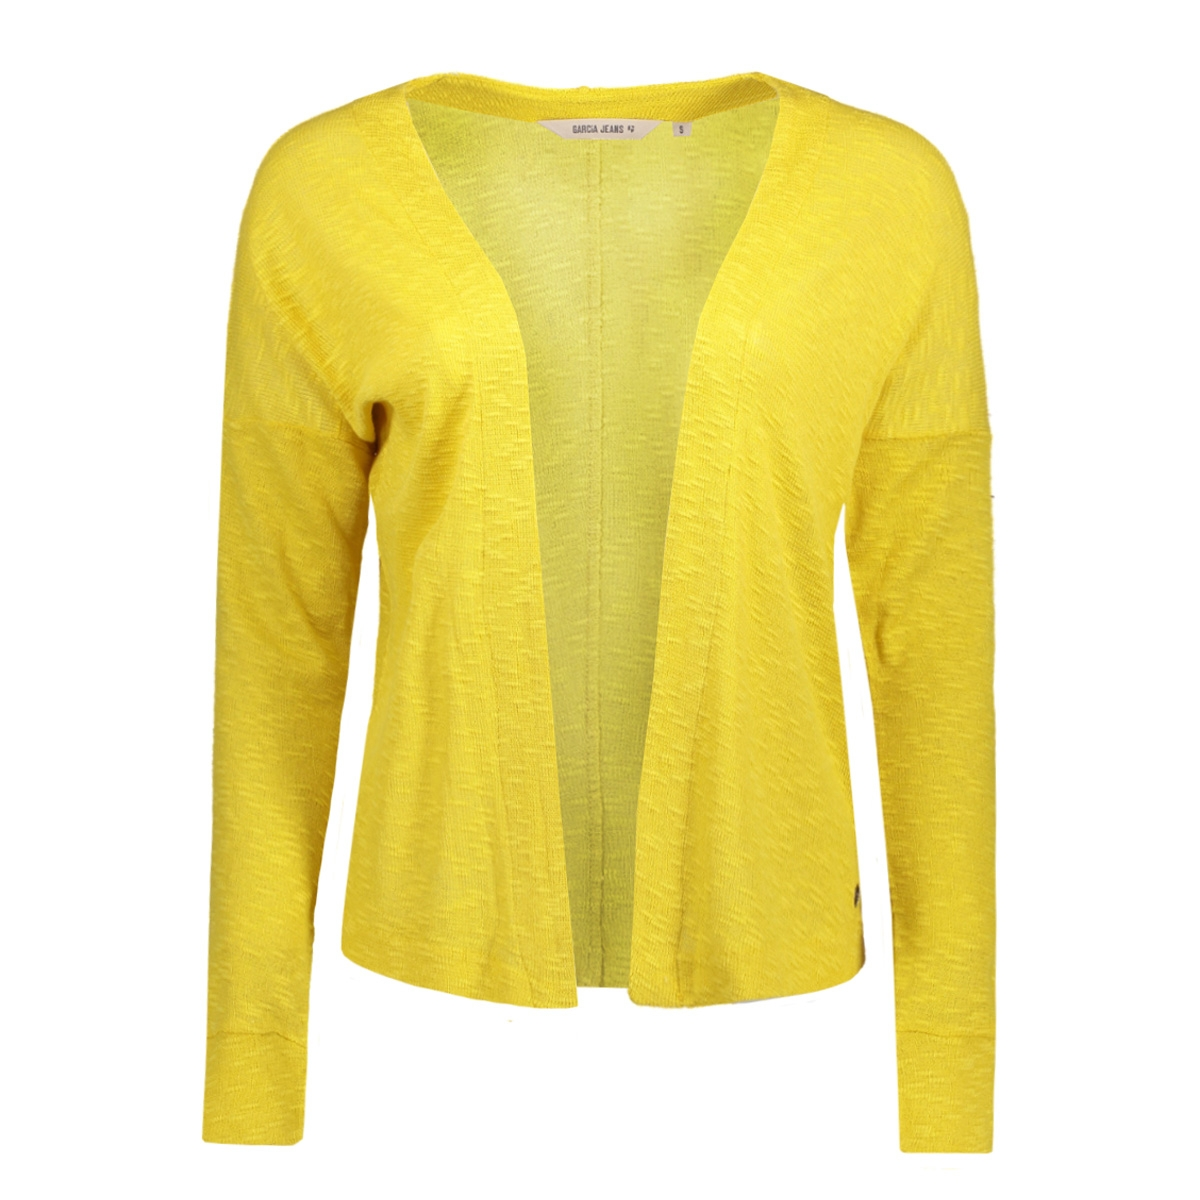 e70041 garcia vest 2225 ochre yellow